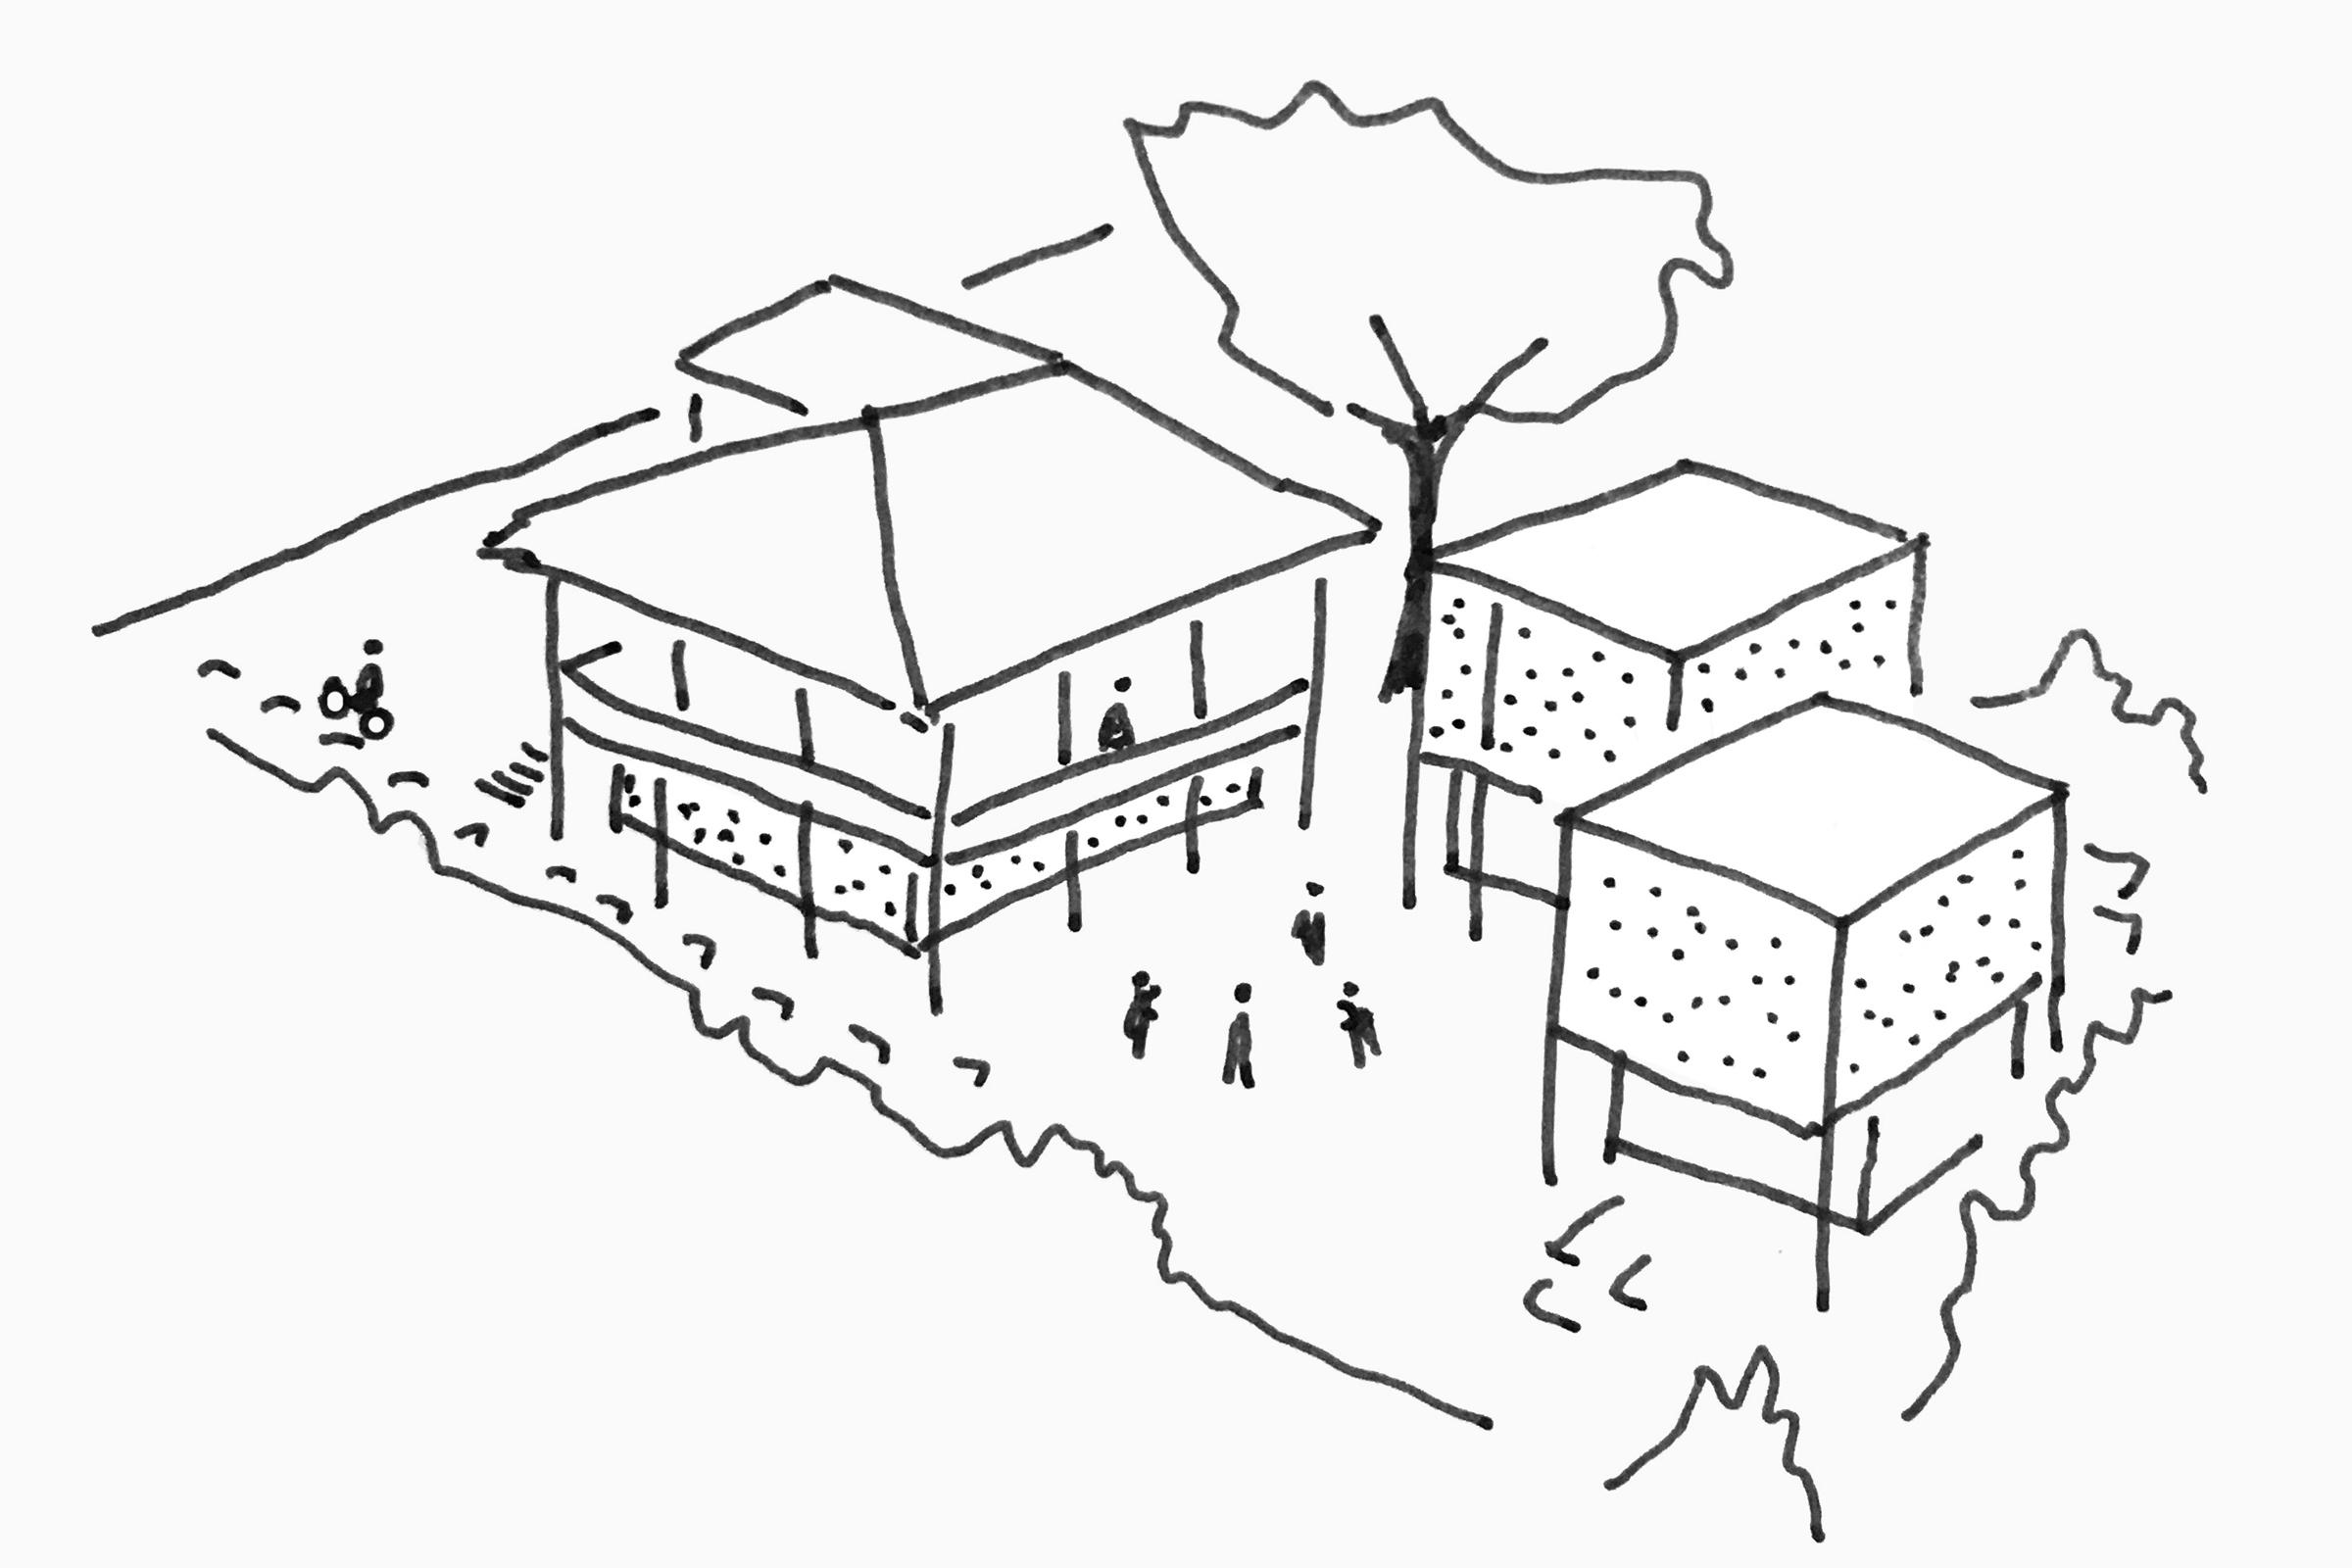 QUEENSLAND-RESIDENTIAL-ARCHITECT-TRIAS-STUDIO-QUEENSLAND-HOUSE-D03